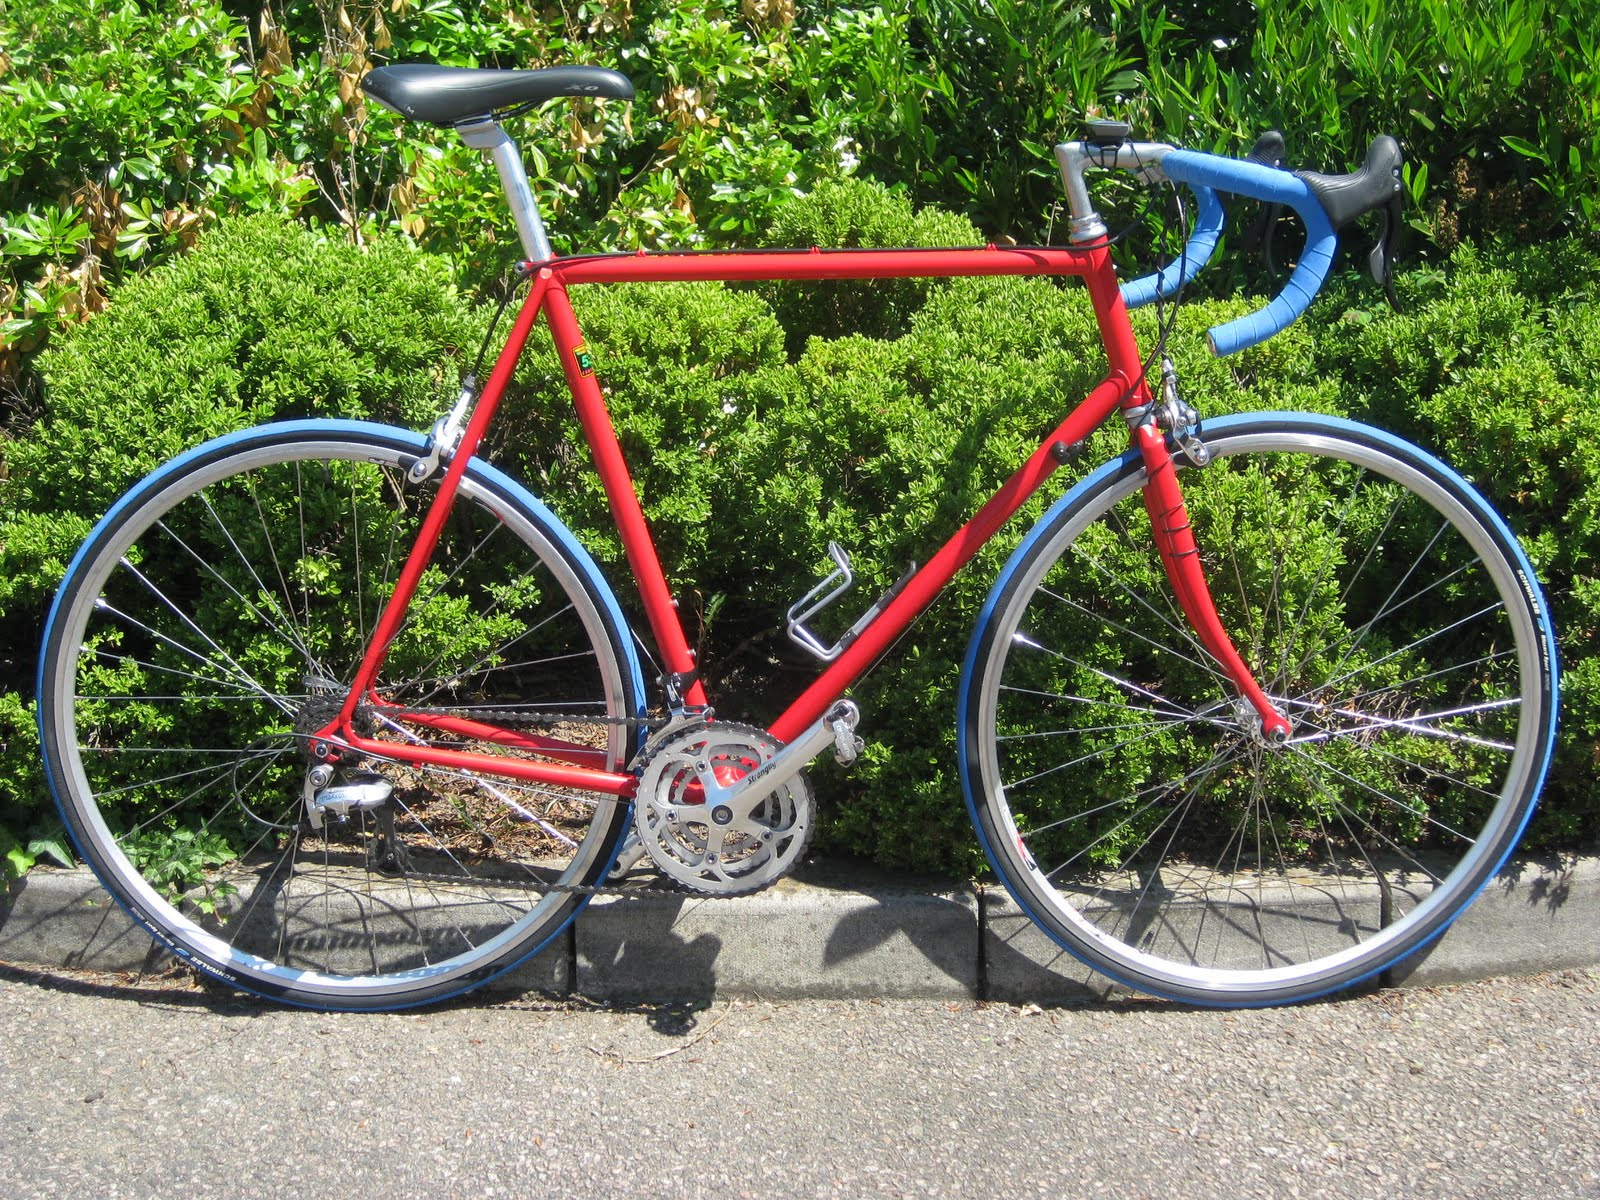 Chuck Glider\'s Bicycle Workshop: Shimergo Reynolds 531C road bike